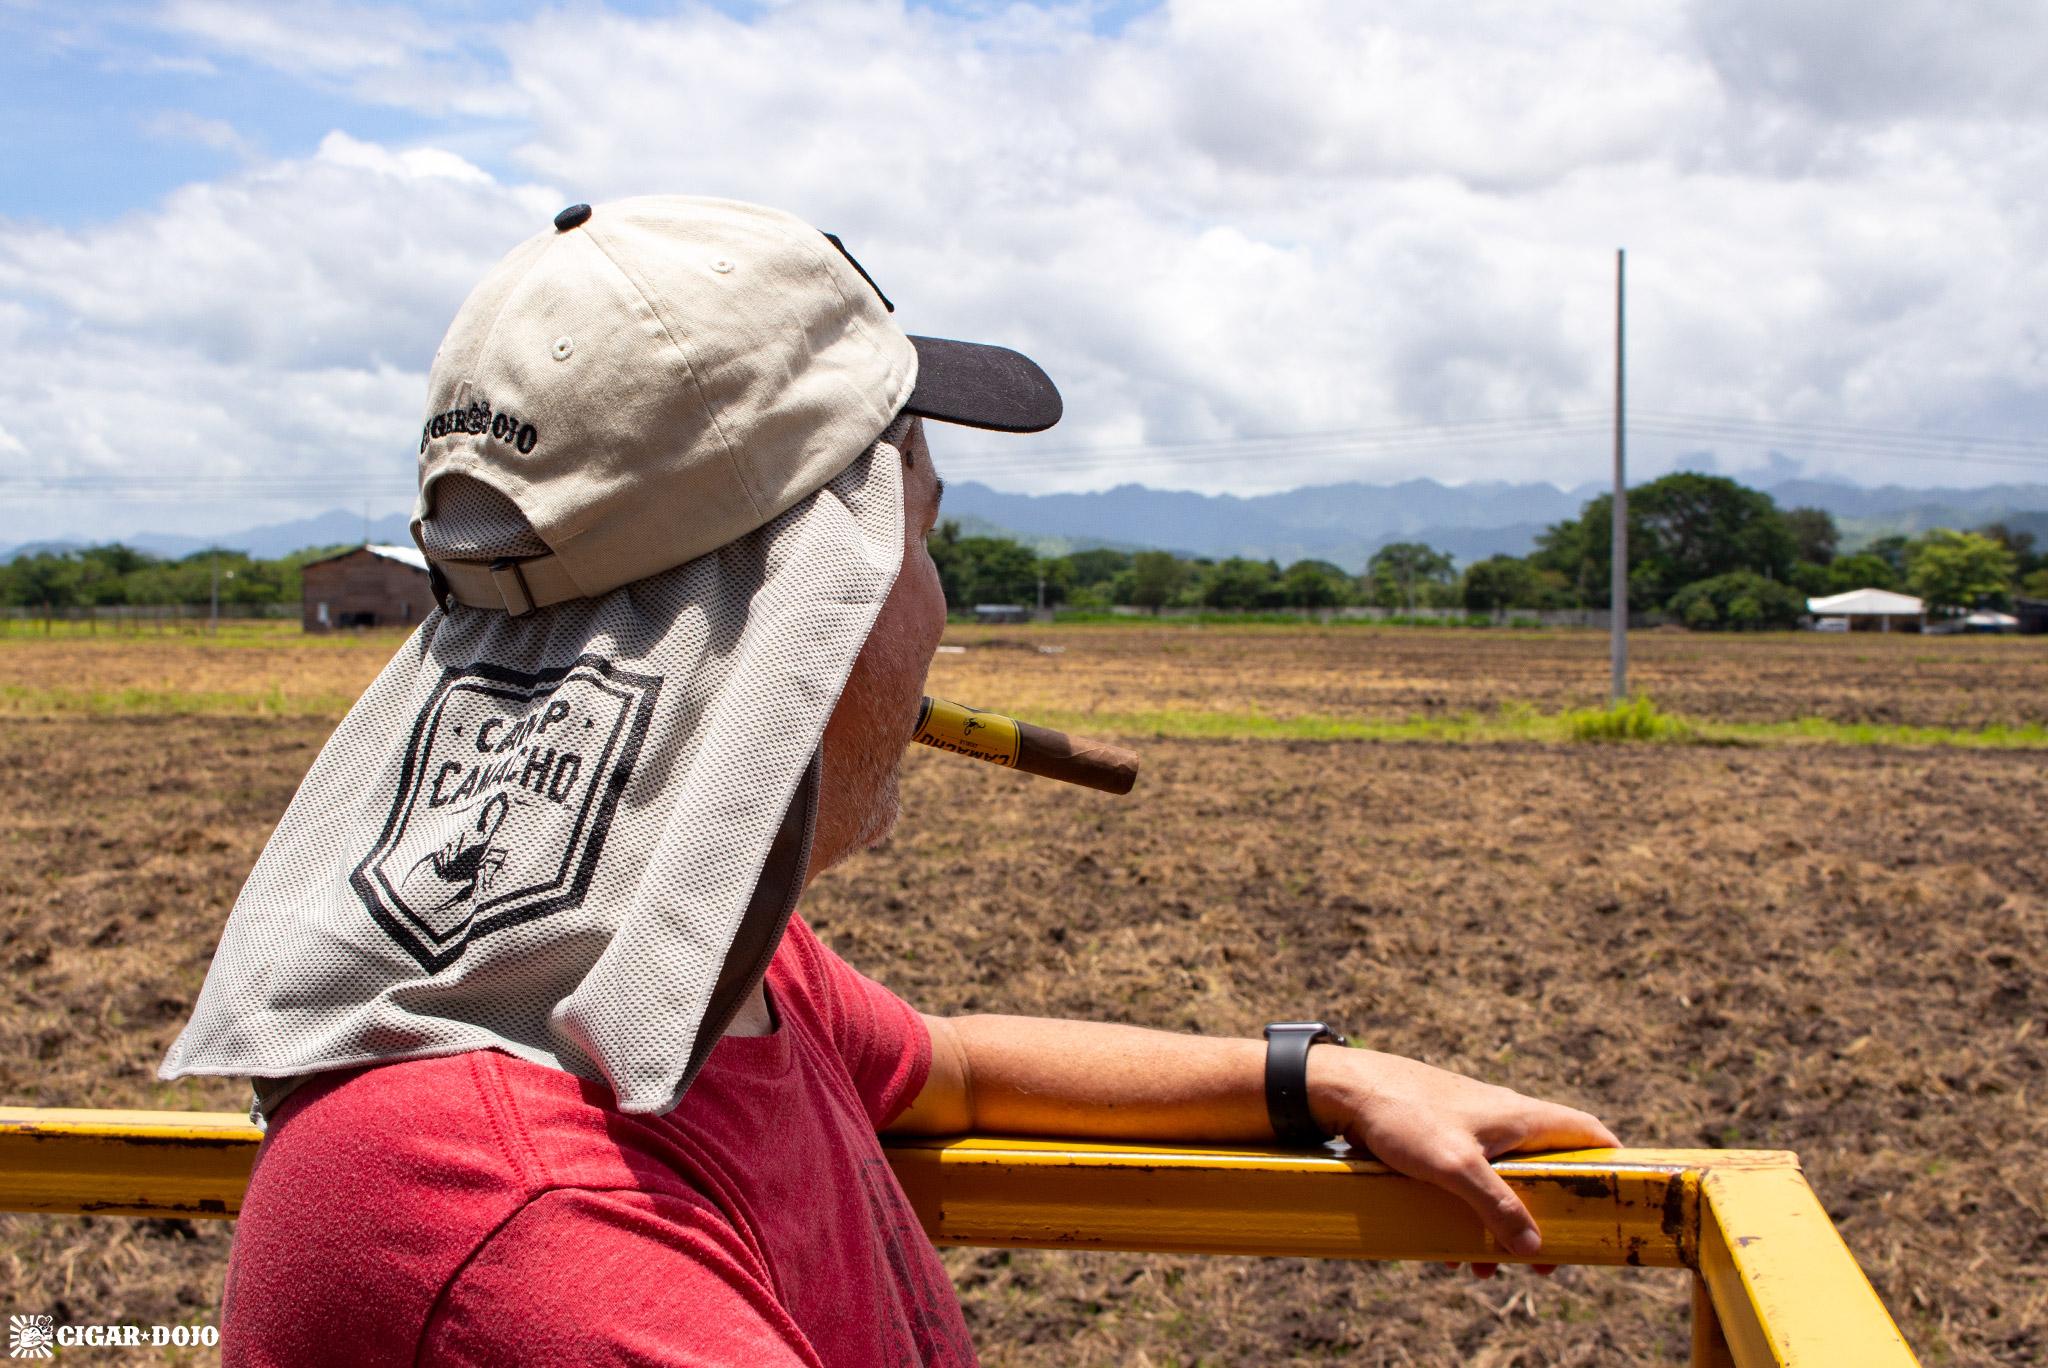 Camacho Diadema Cigars de Honduras tobacco field